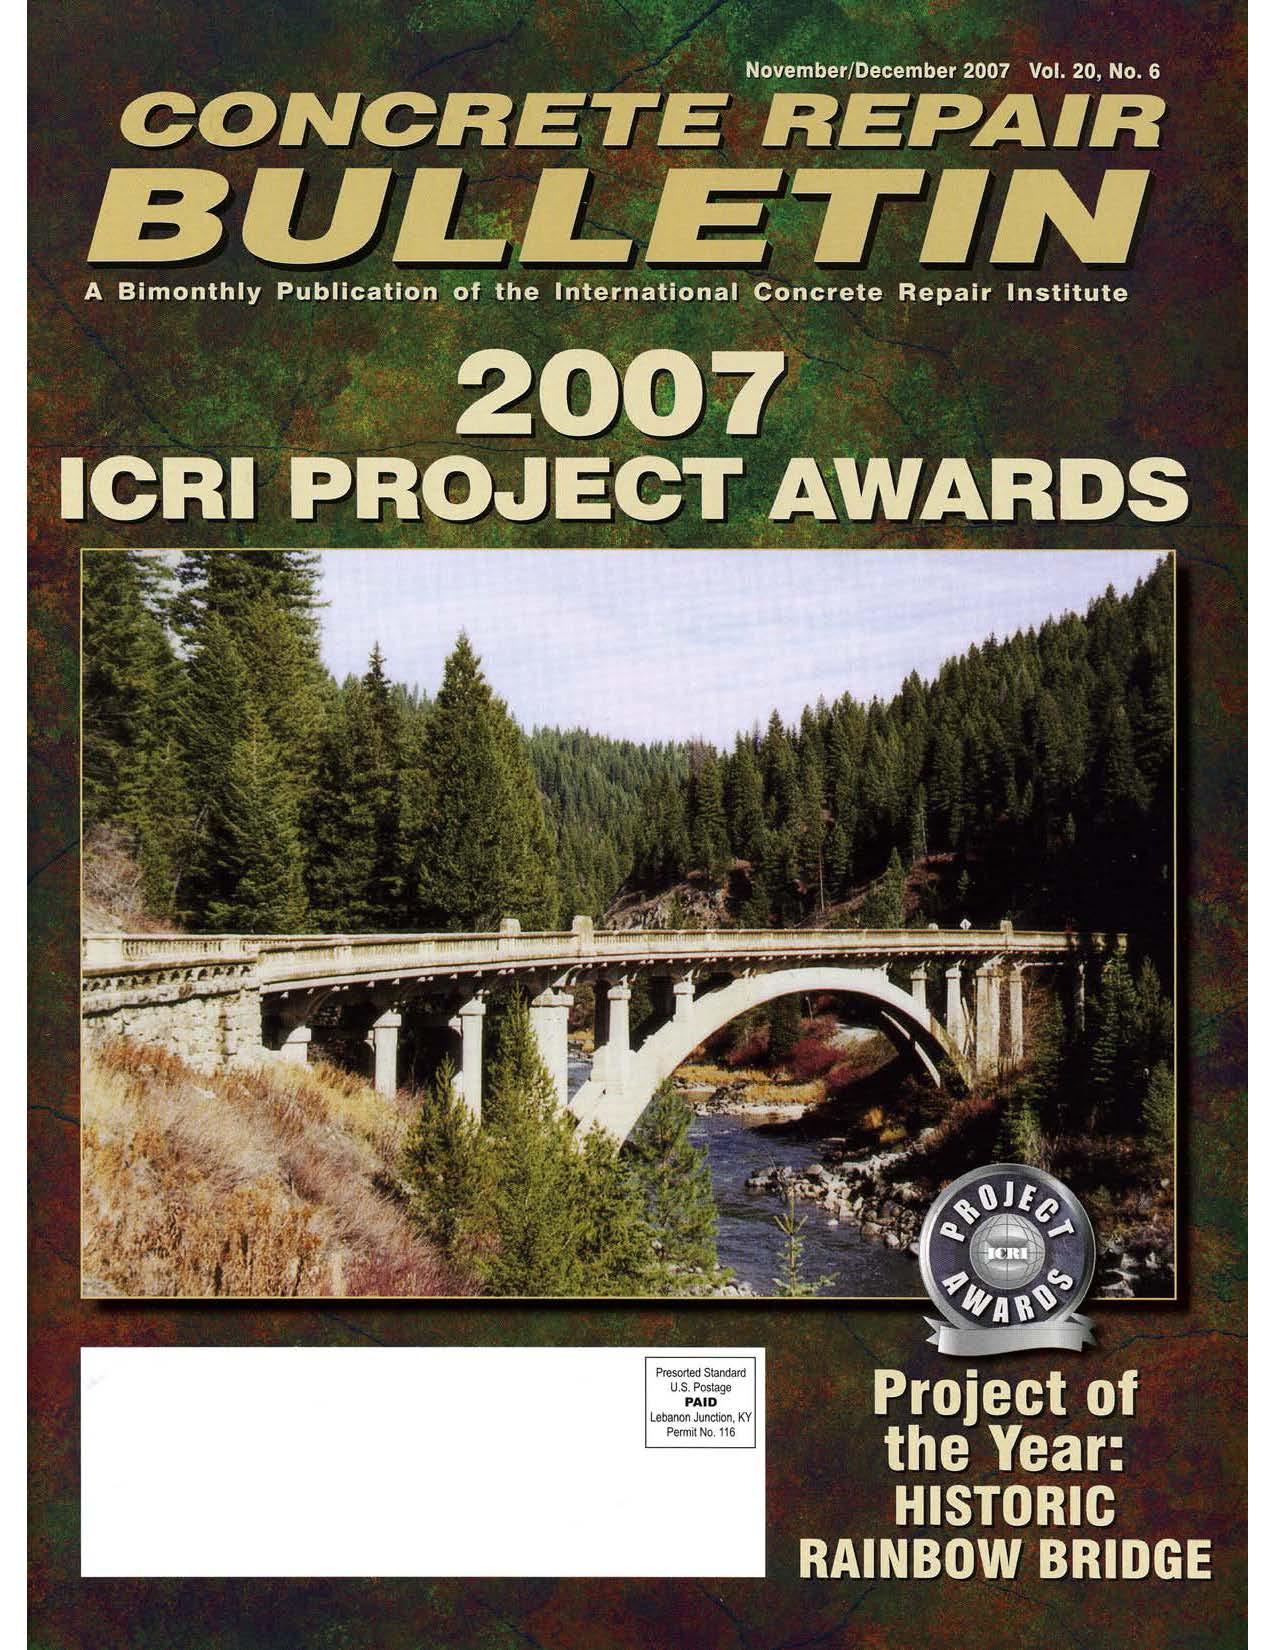 USMCM - ICRI award 2007 Iwo Jima_Page_1.jpg